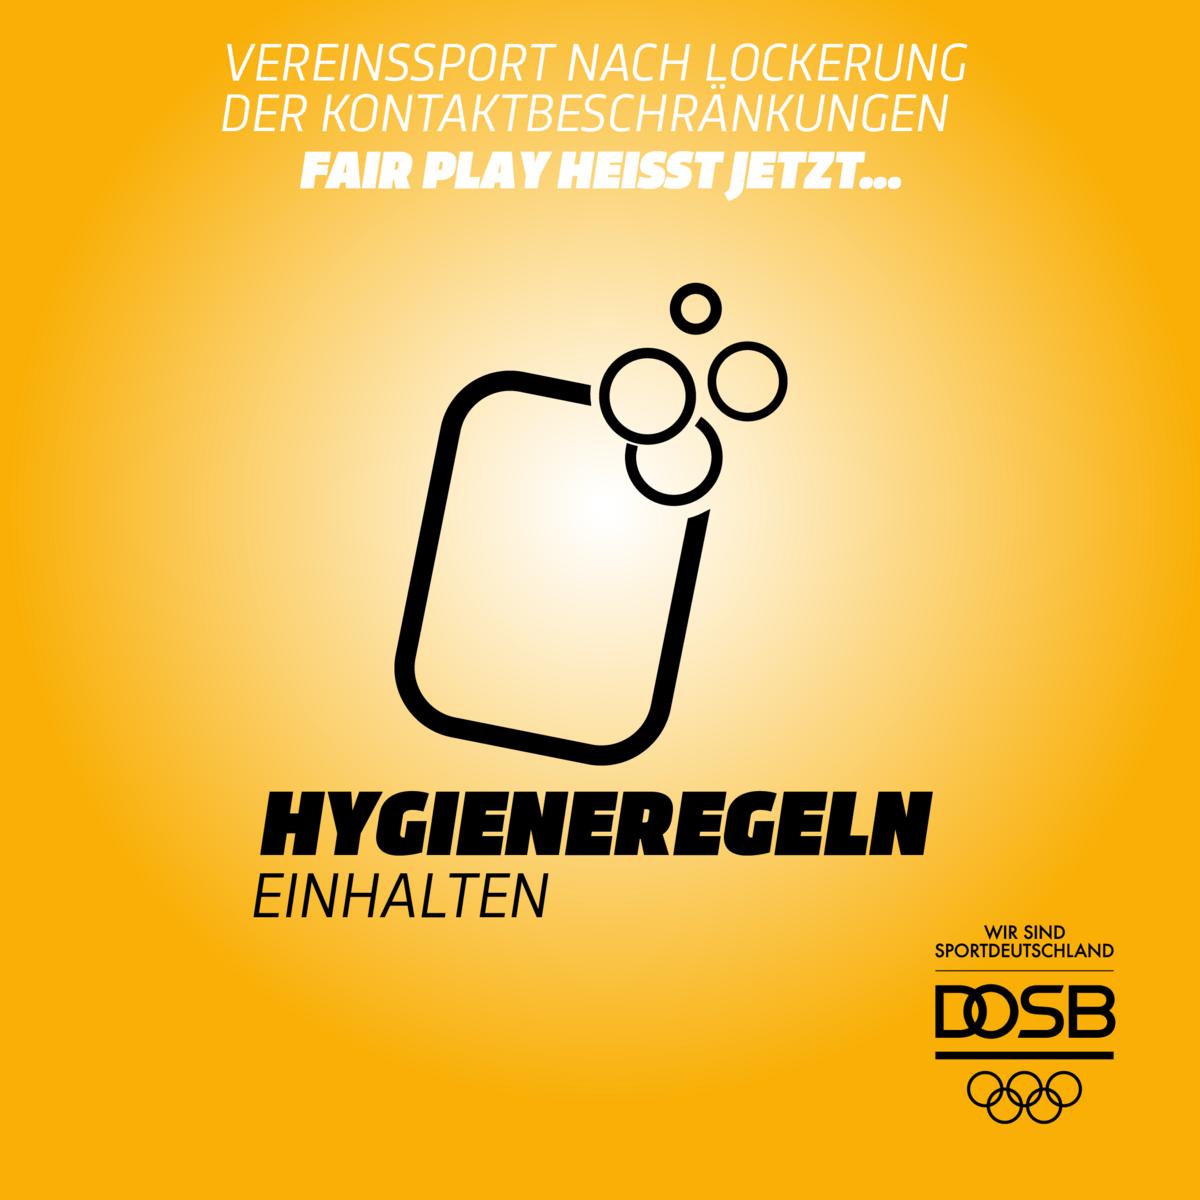 csm_Leitplanken-08_2x_997106b760